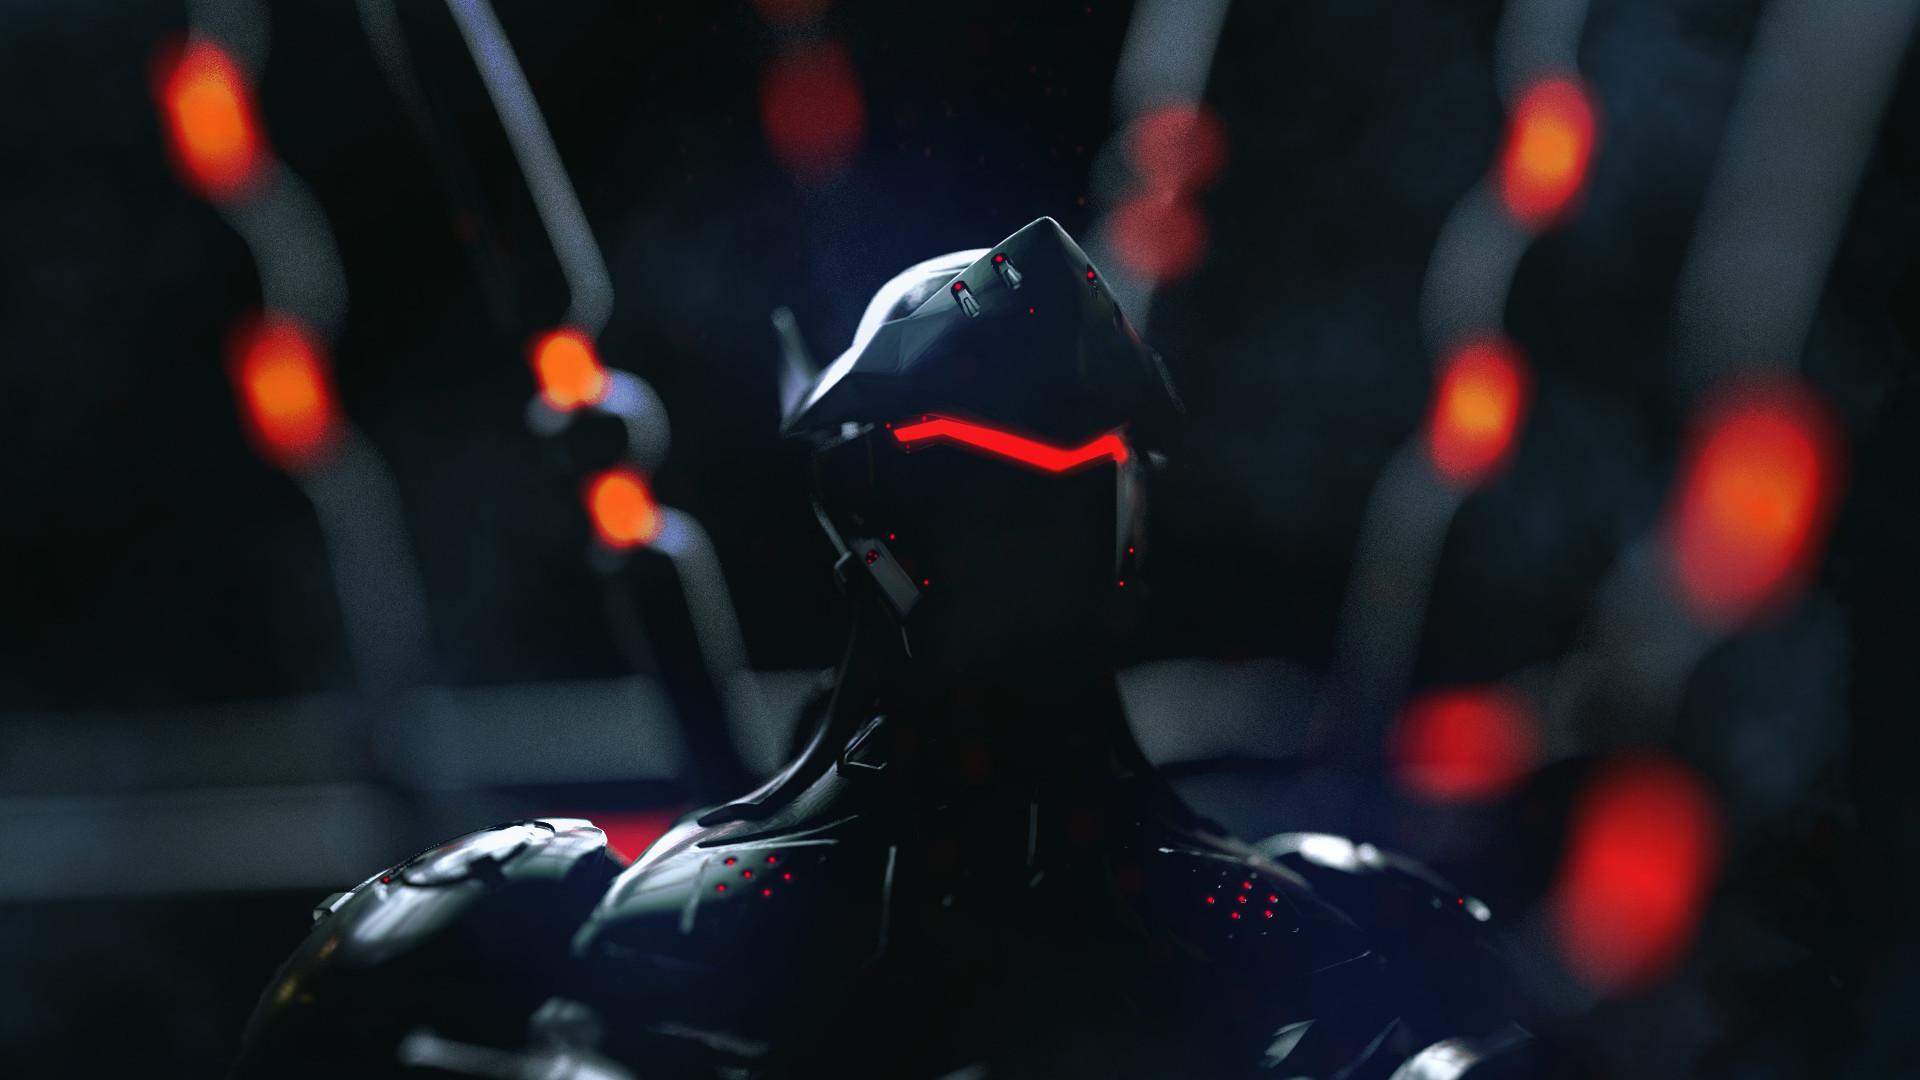 Wallpaper Rakan Khamash Genji Overwatch Neon Cyborg 1920x1080 Mbetley 1226457 Hd Wallpapers Wallhere